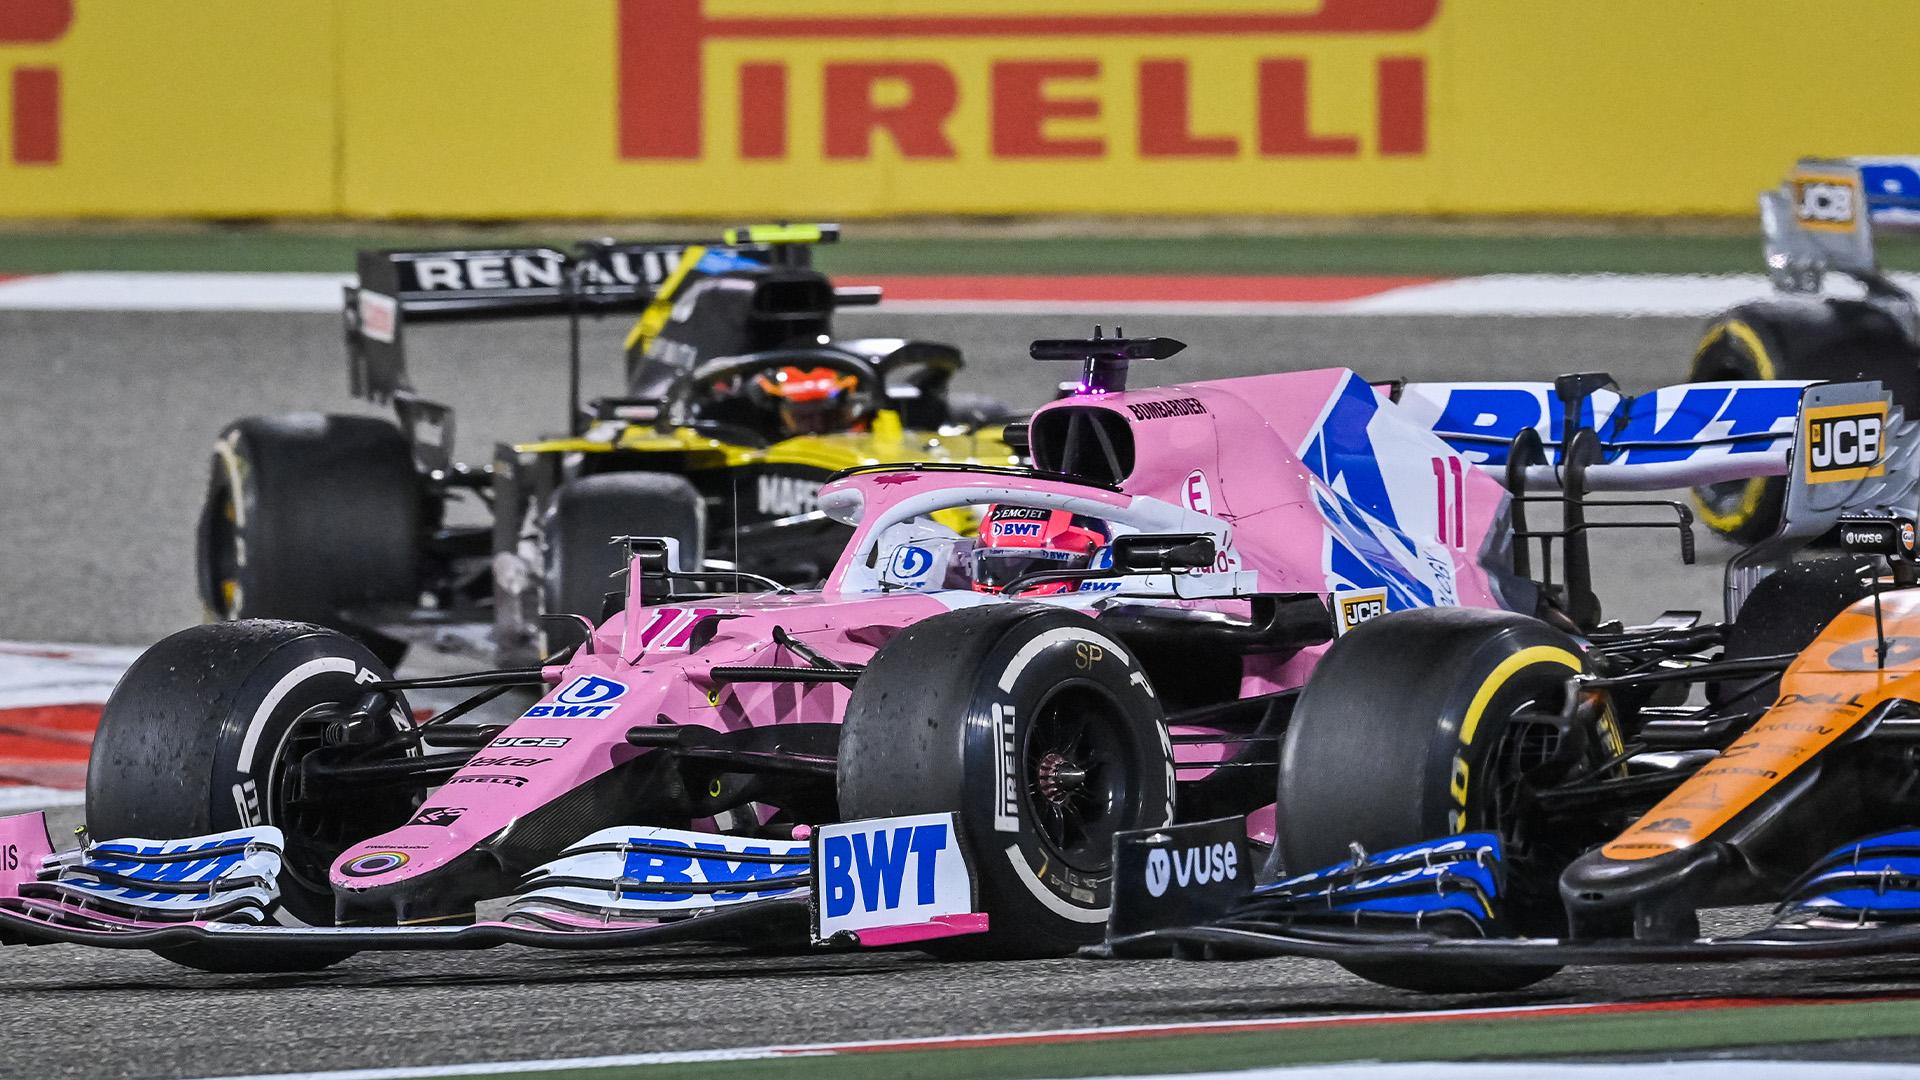 Sergio Perez passes Carlos Sainz during the 2020 Sakhir Grand Prix